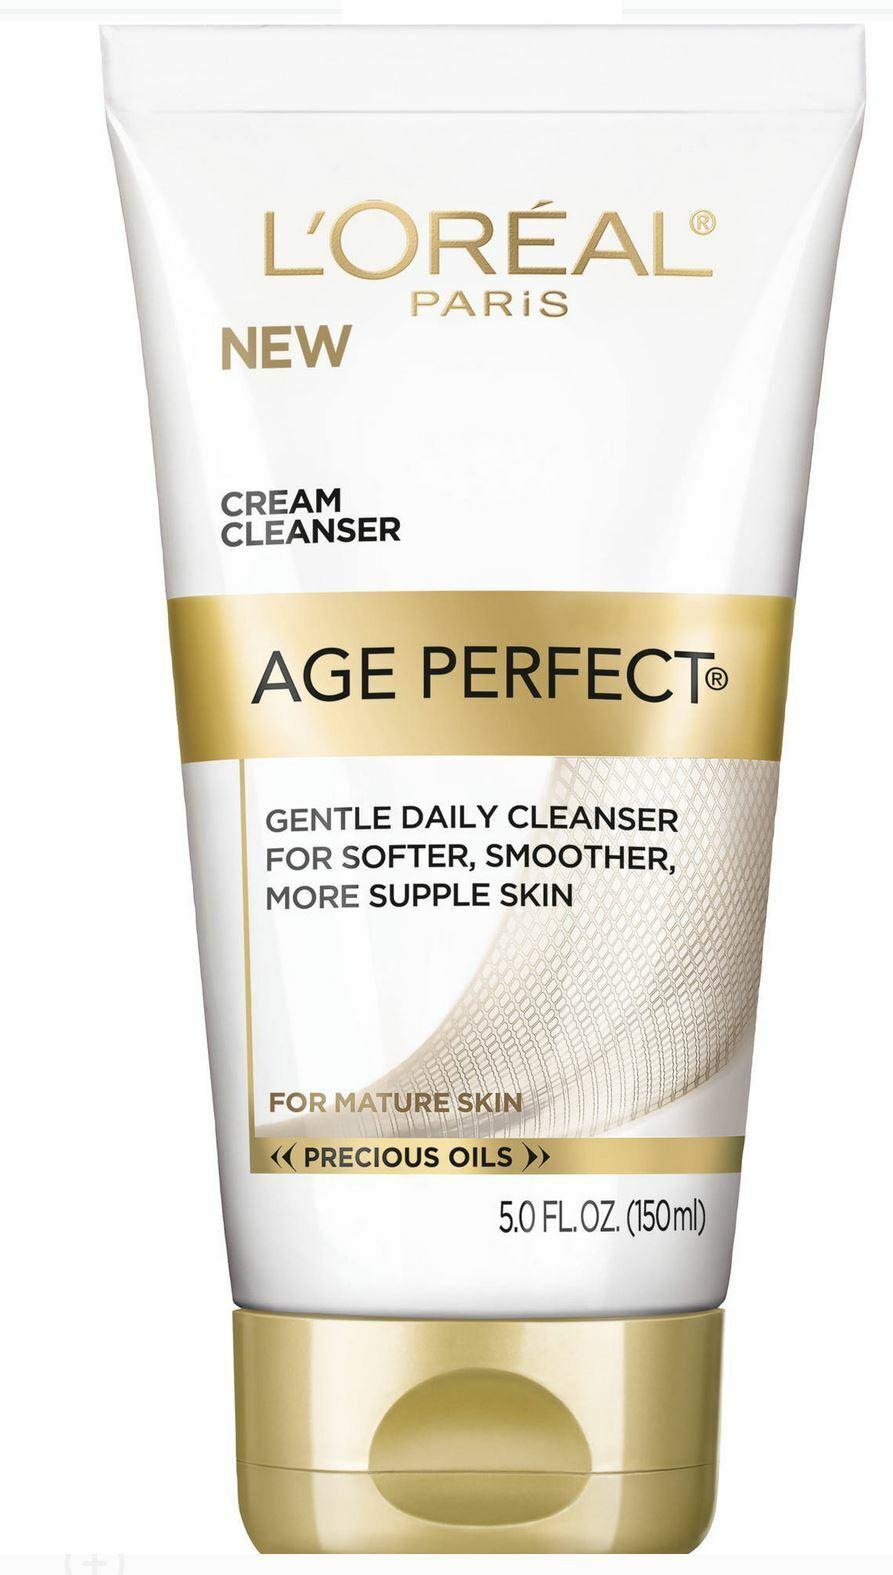 2 L'Oreal Paris Age Perfect Cream Cleanser Tubes Face Wash